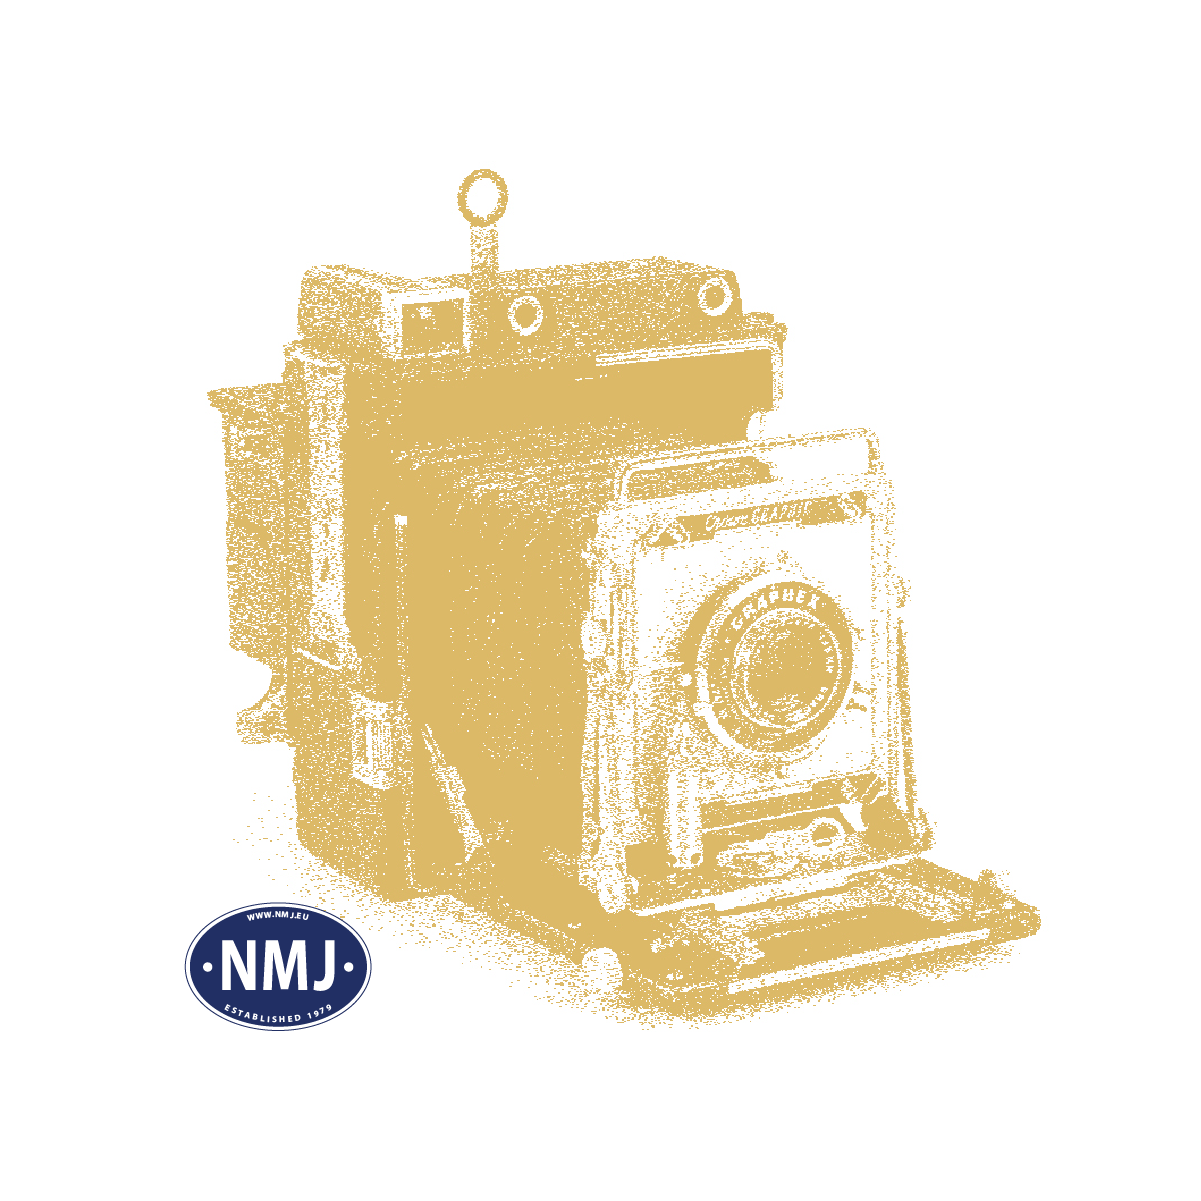 NMJT84.103 - NMJ Topline NSB BM69A.014, DCC w/ Sound